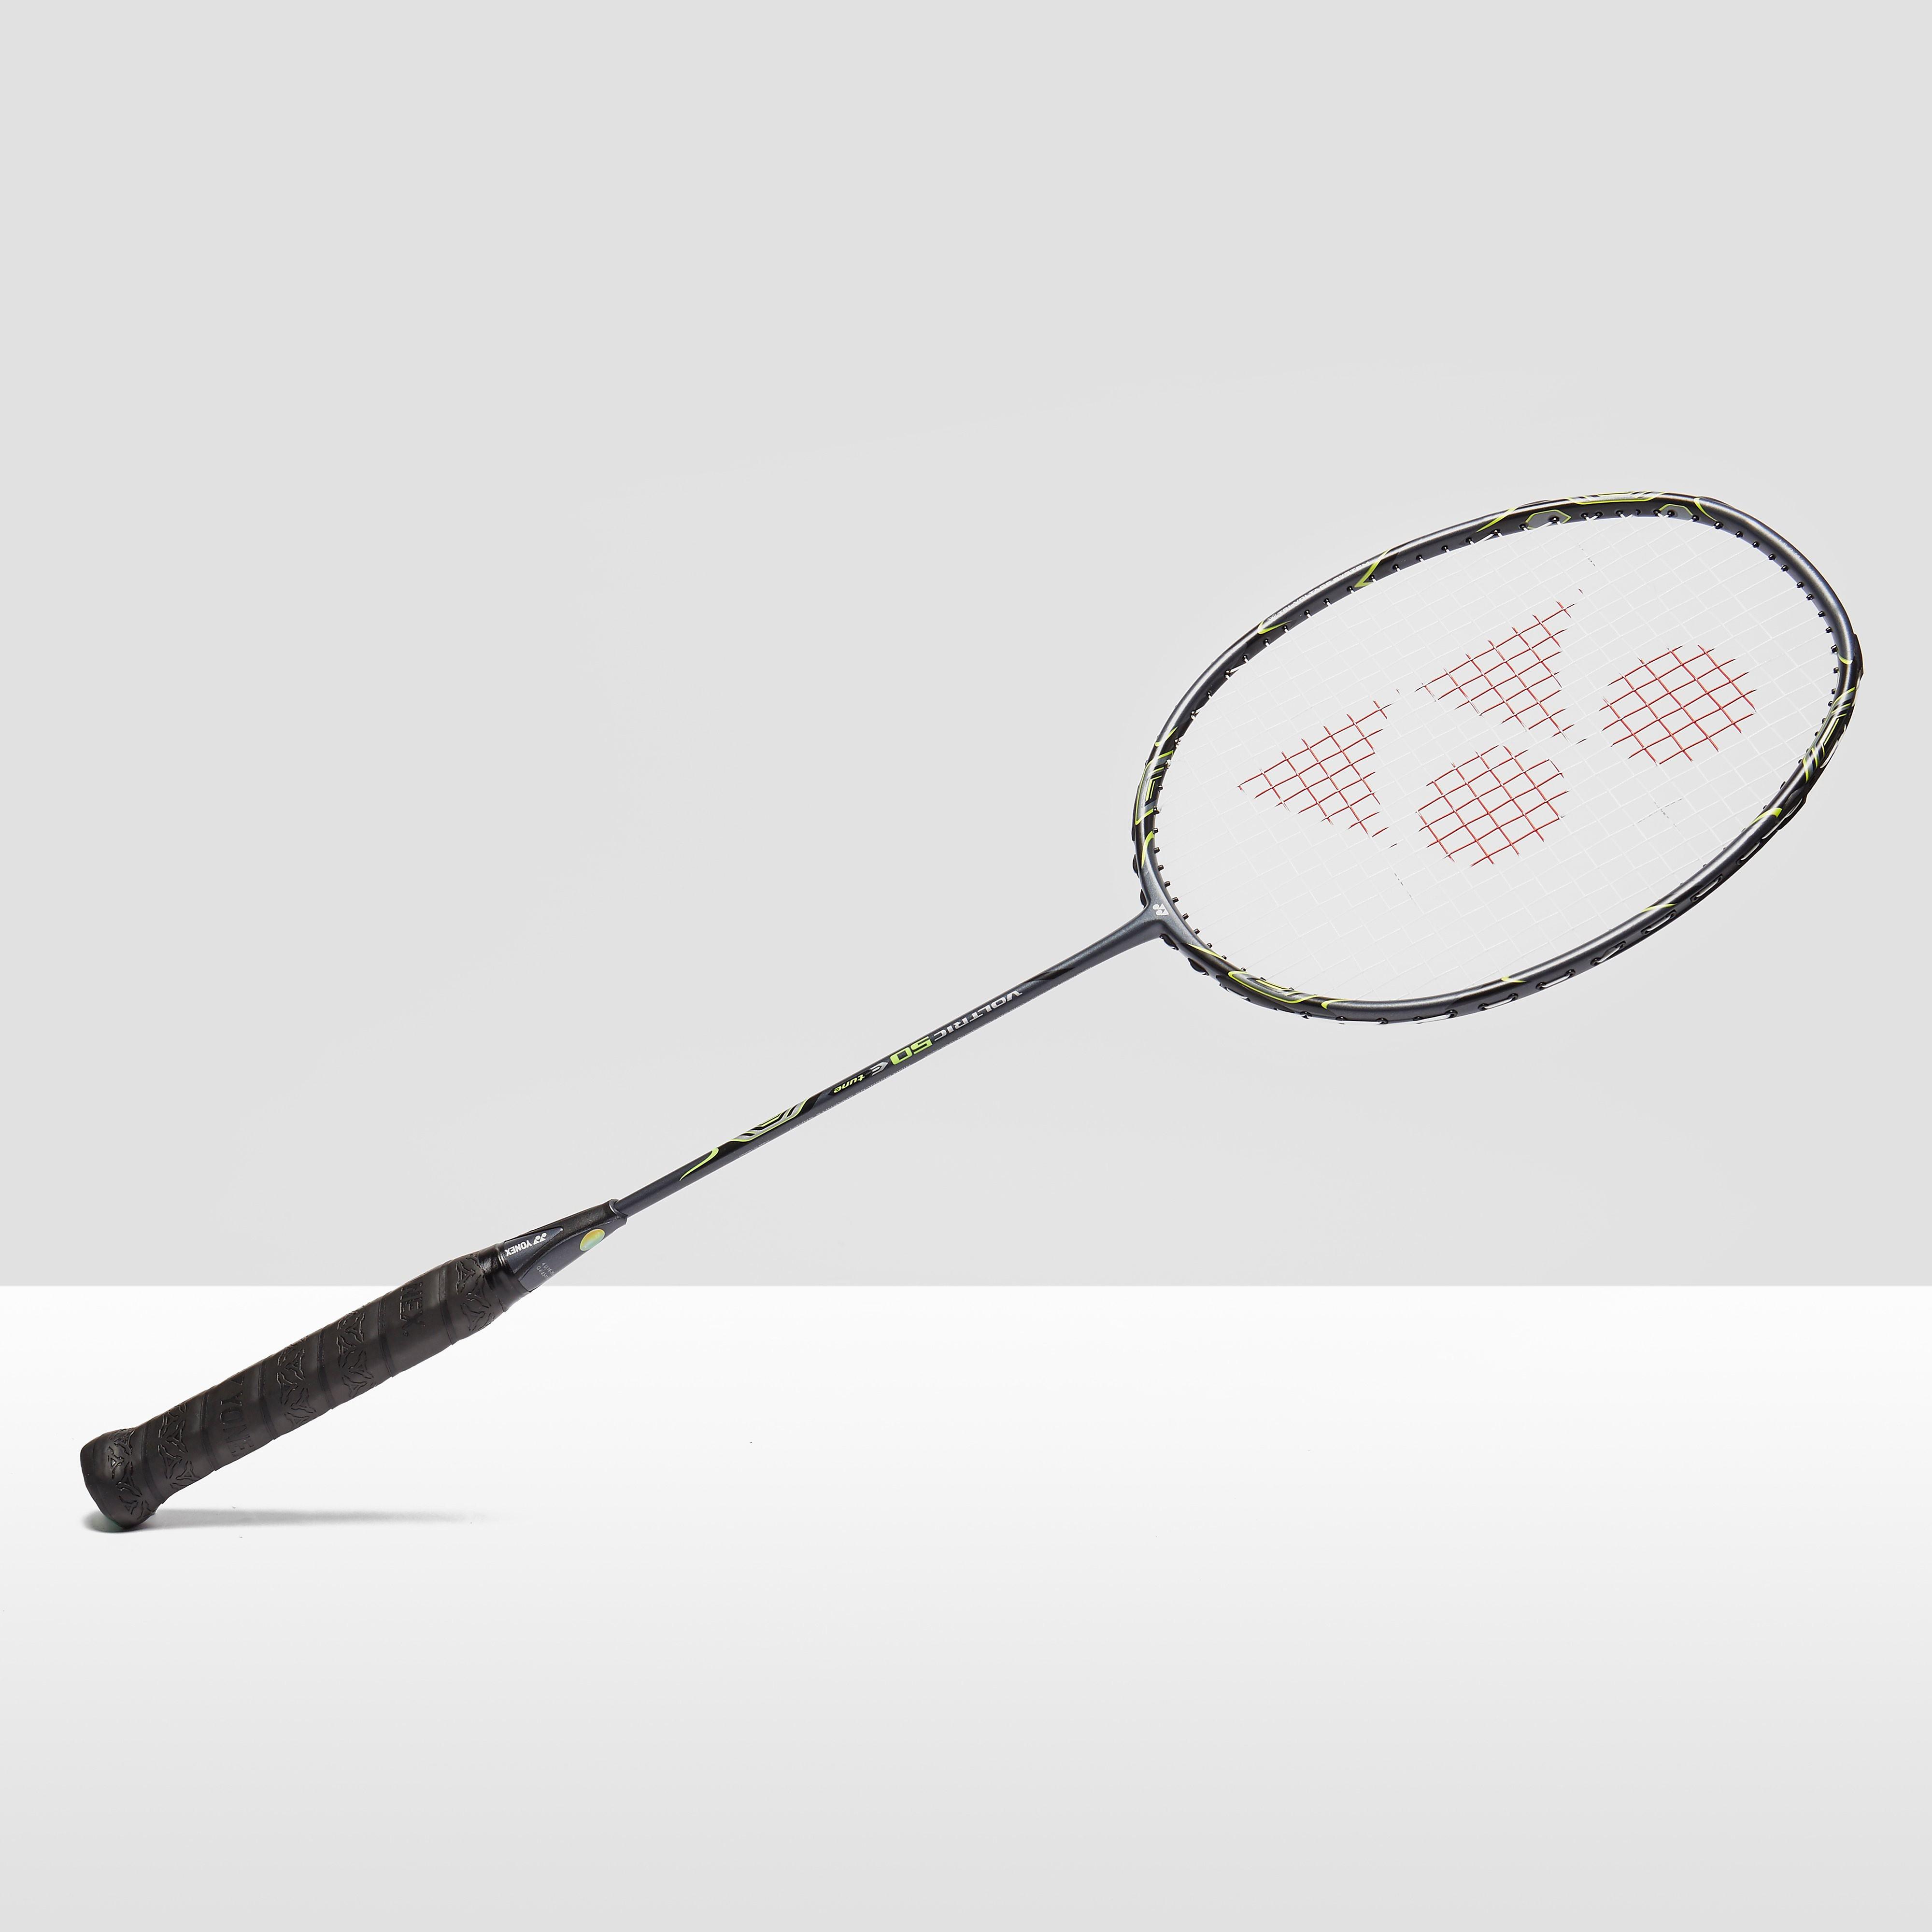 Yonex Voltric 50 E-Tune Badminton Racket